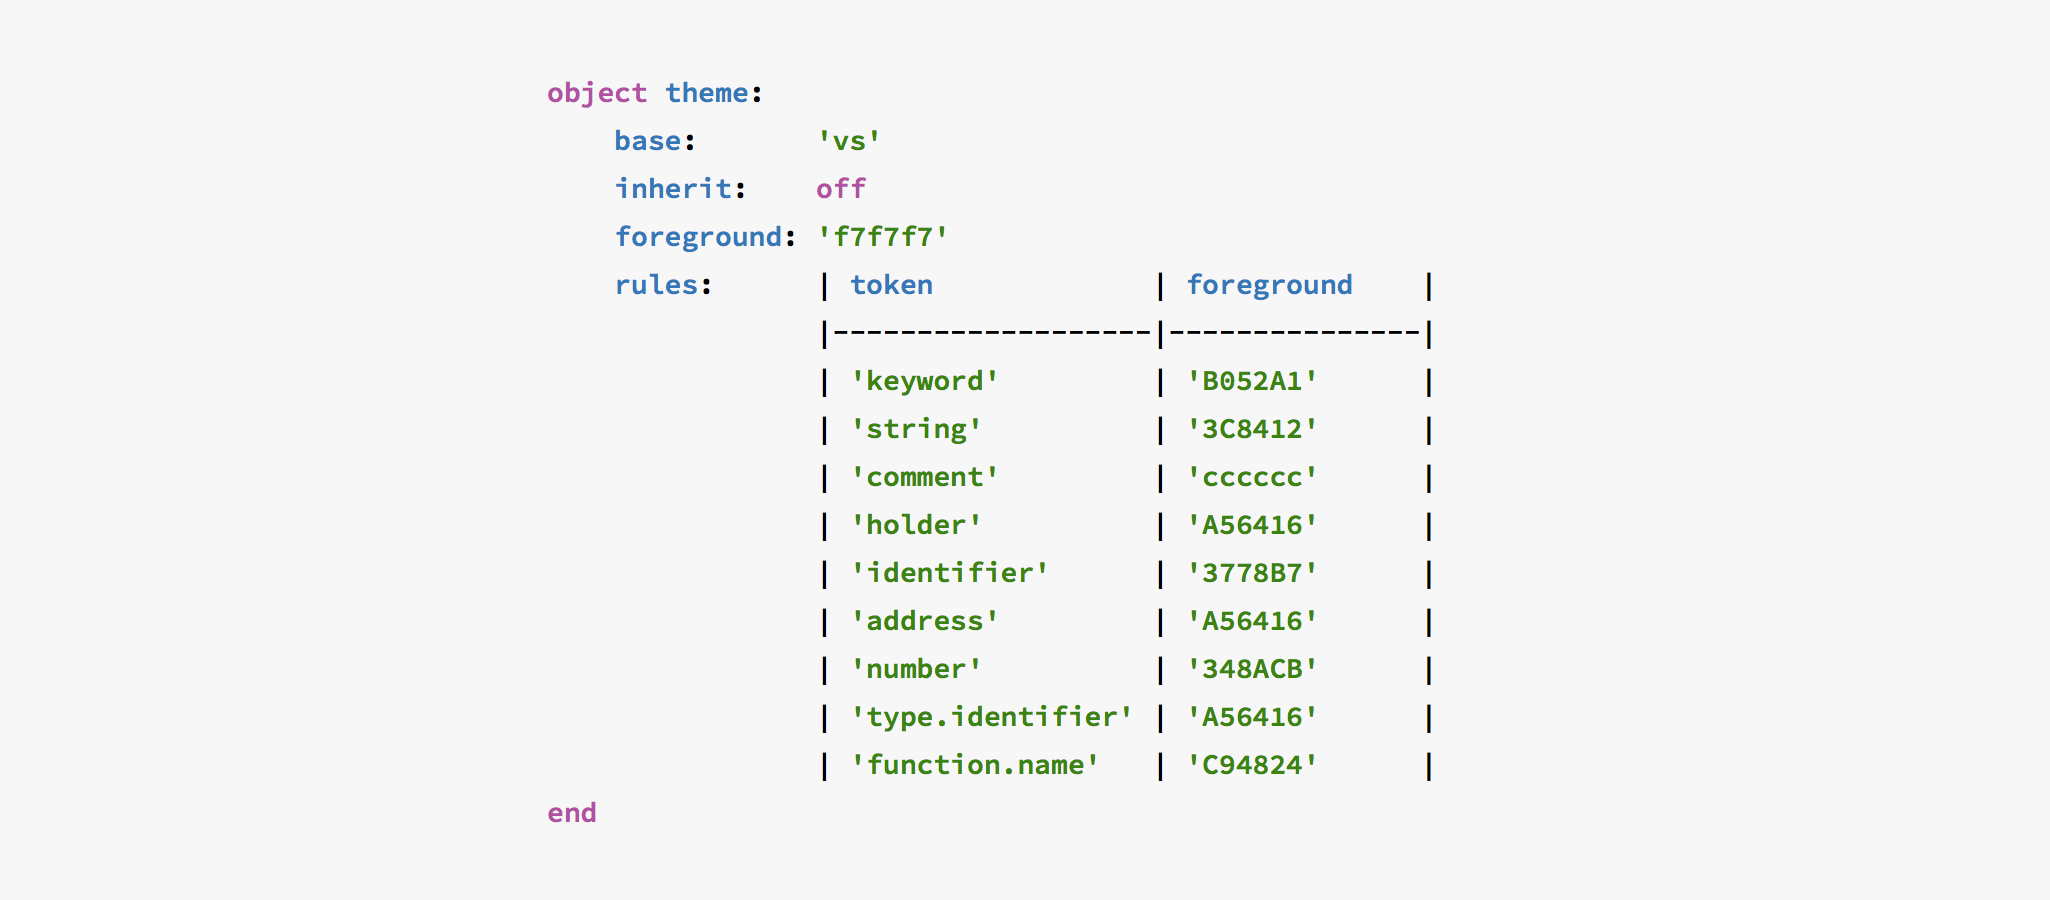 KaryScript Sample Code - An Object